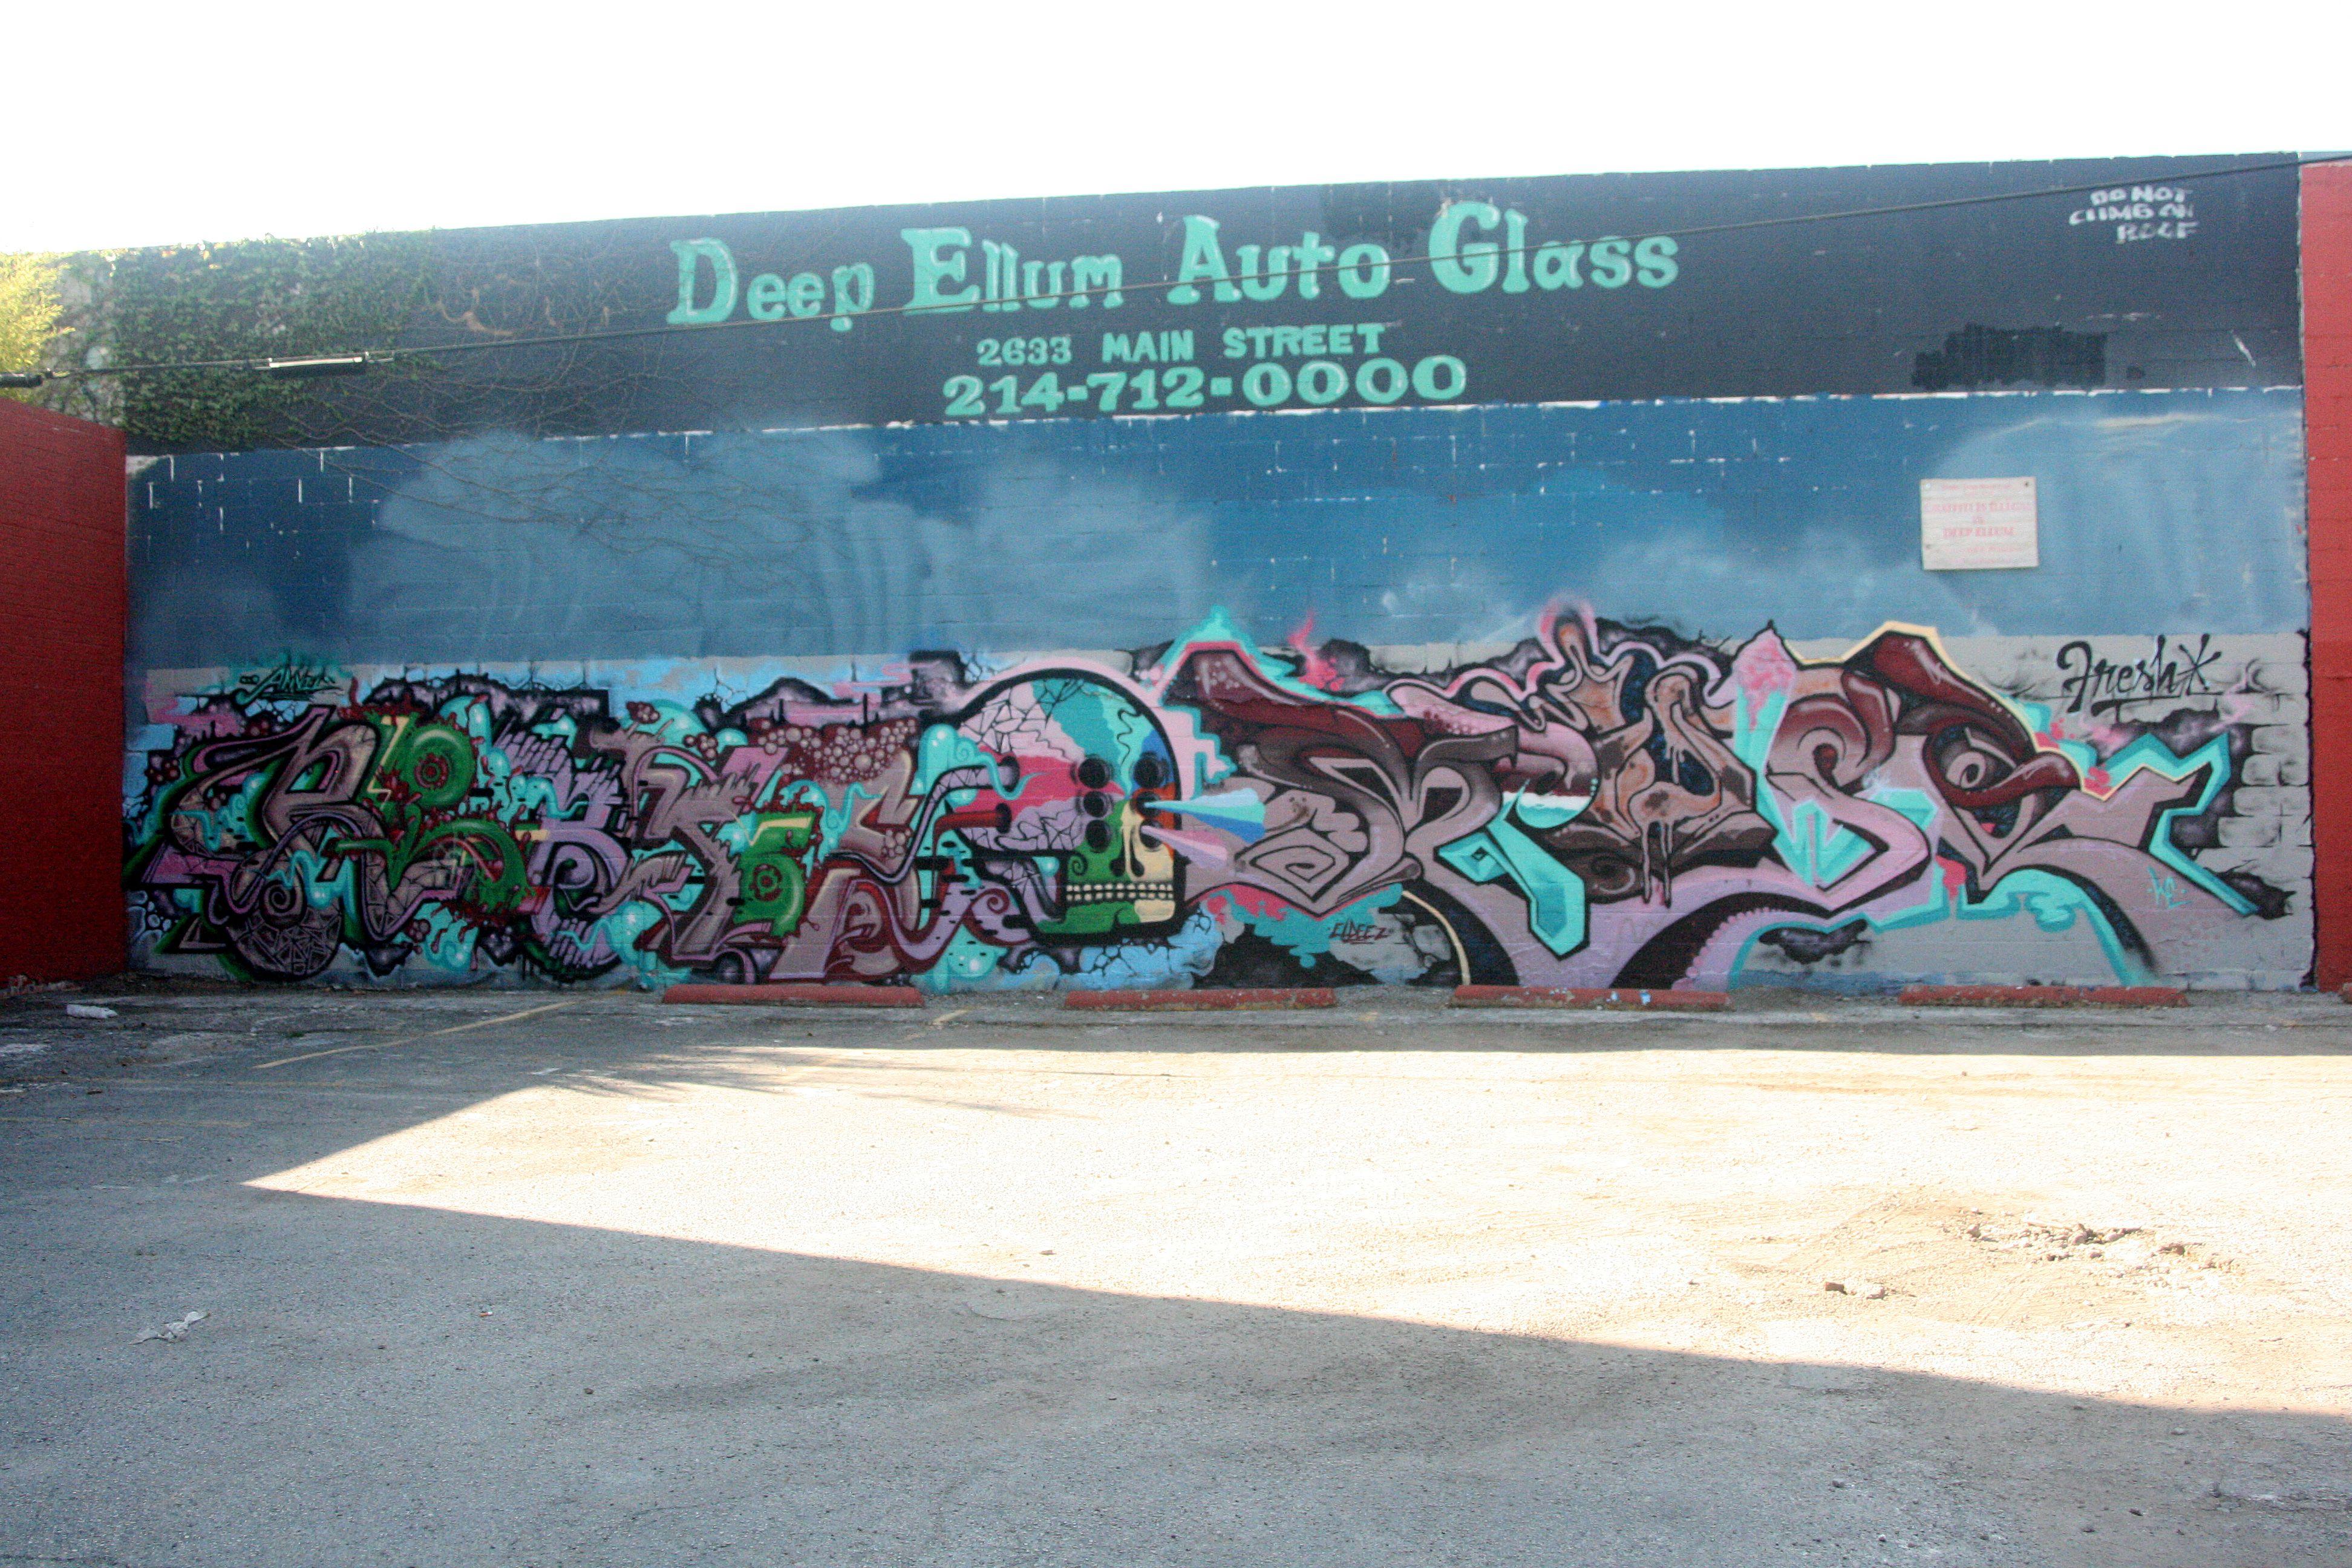 Deep ellum auto glass dallas street art street art